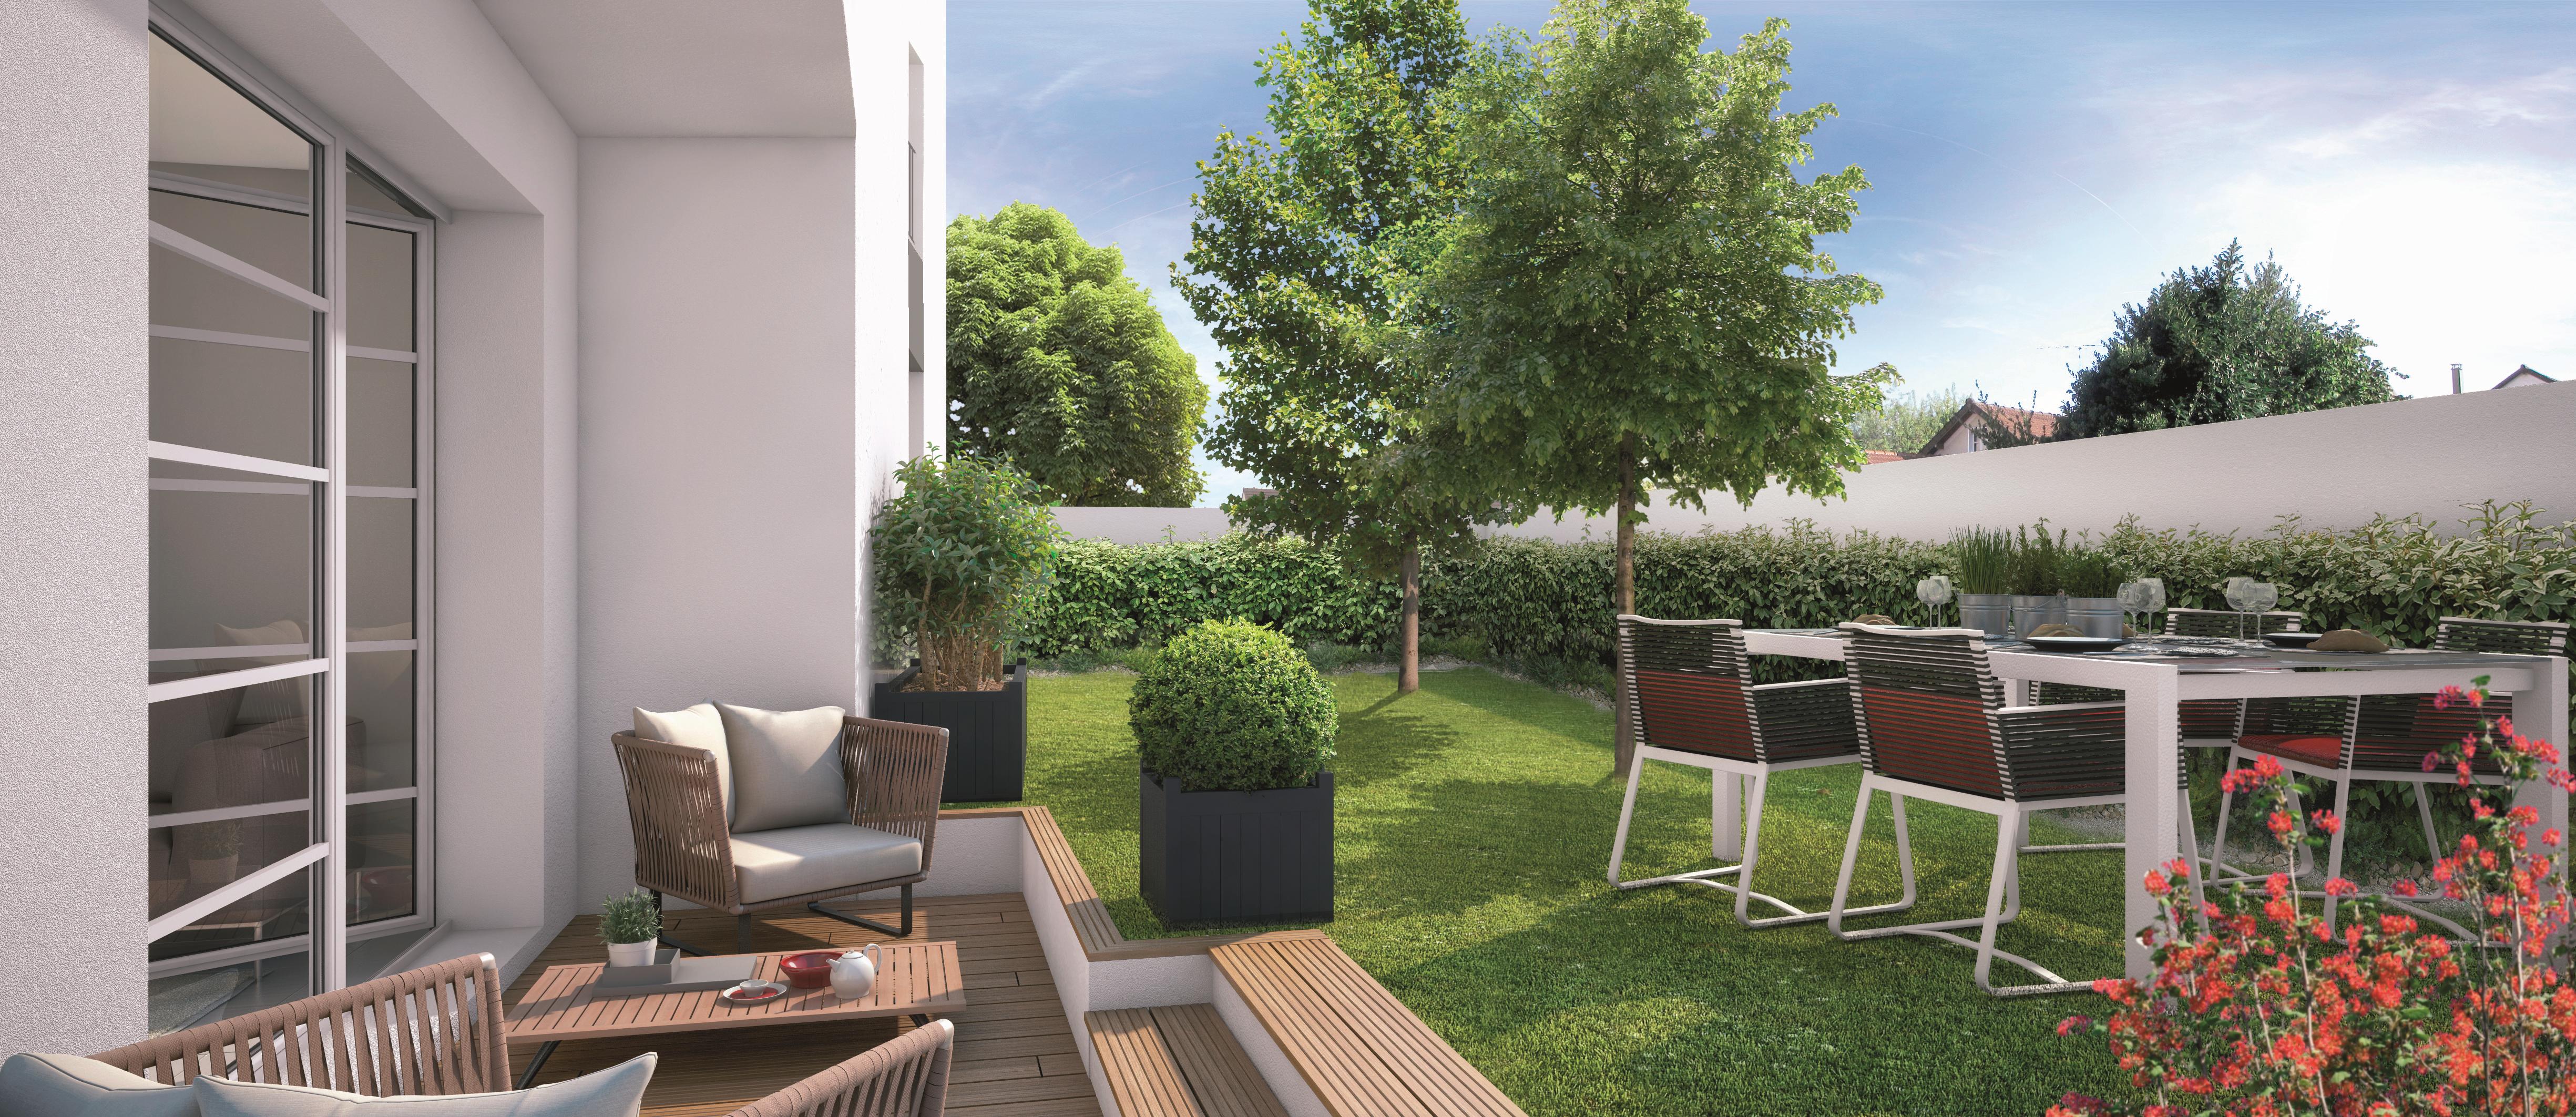 LE VILLARE - Green City Immobilier